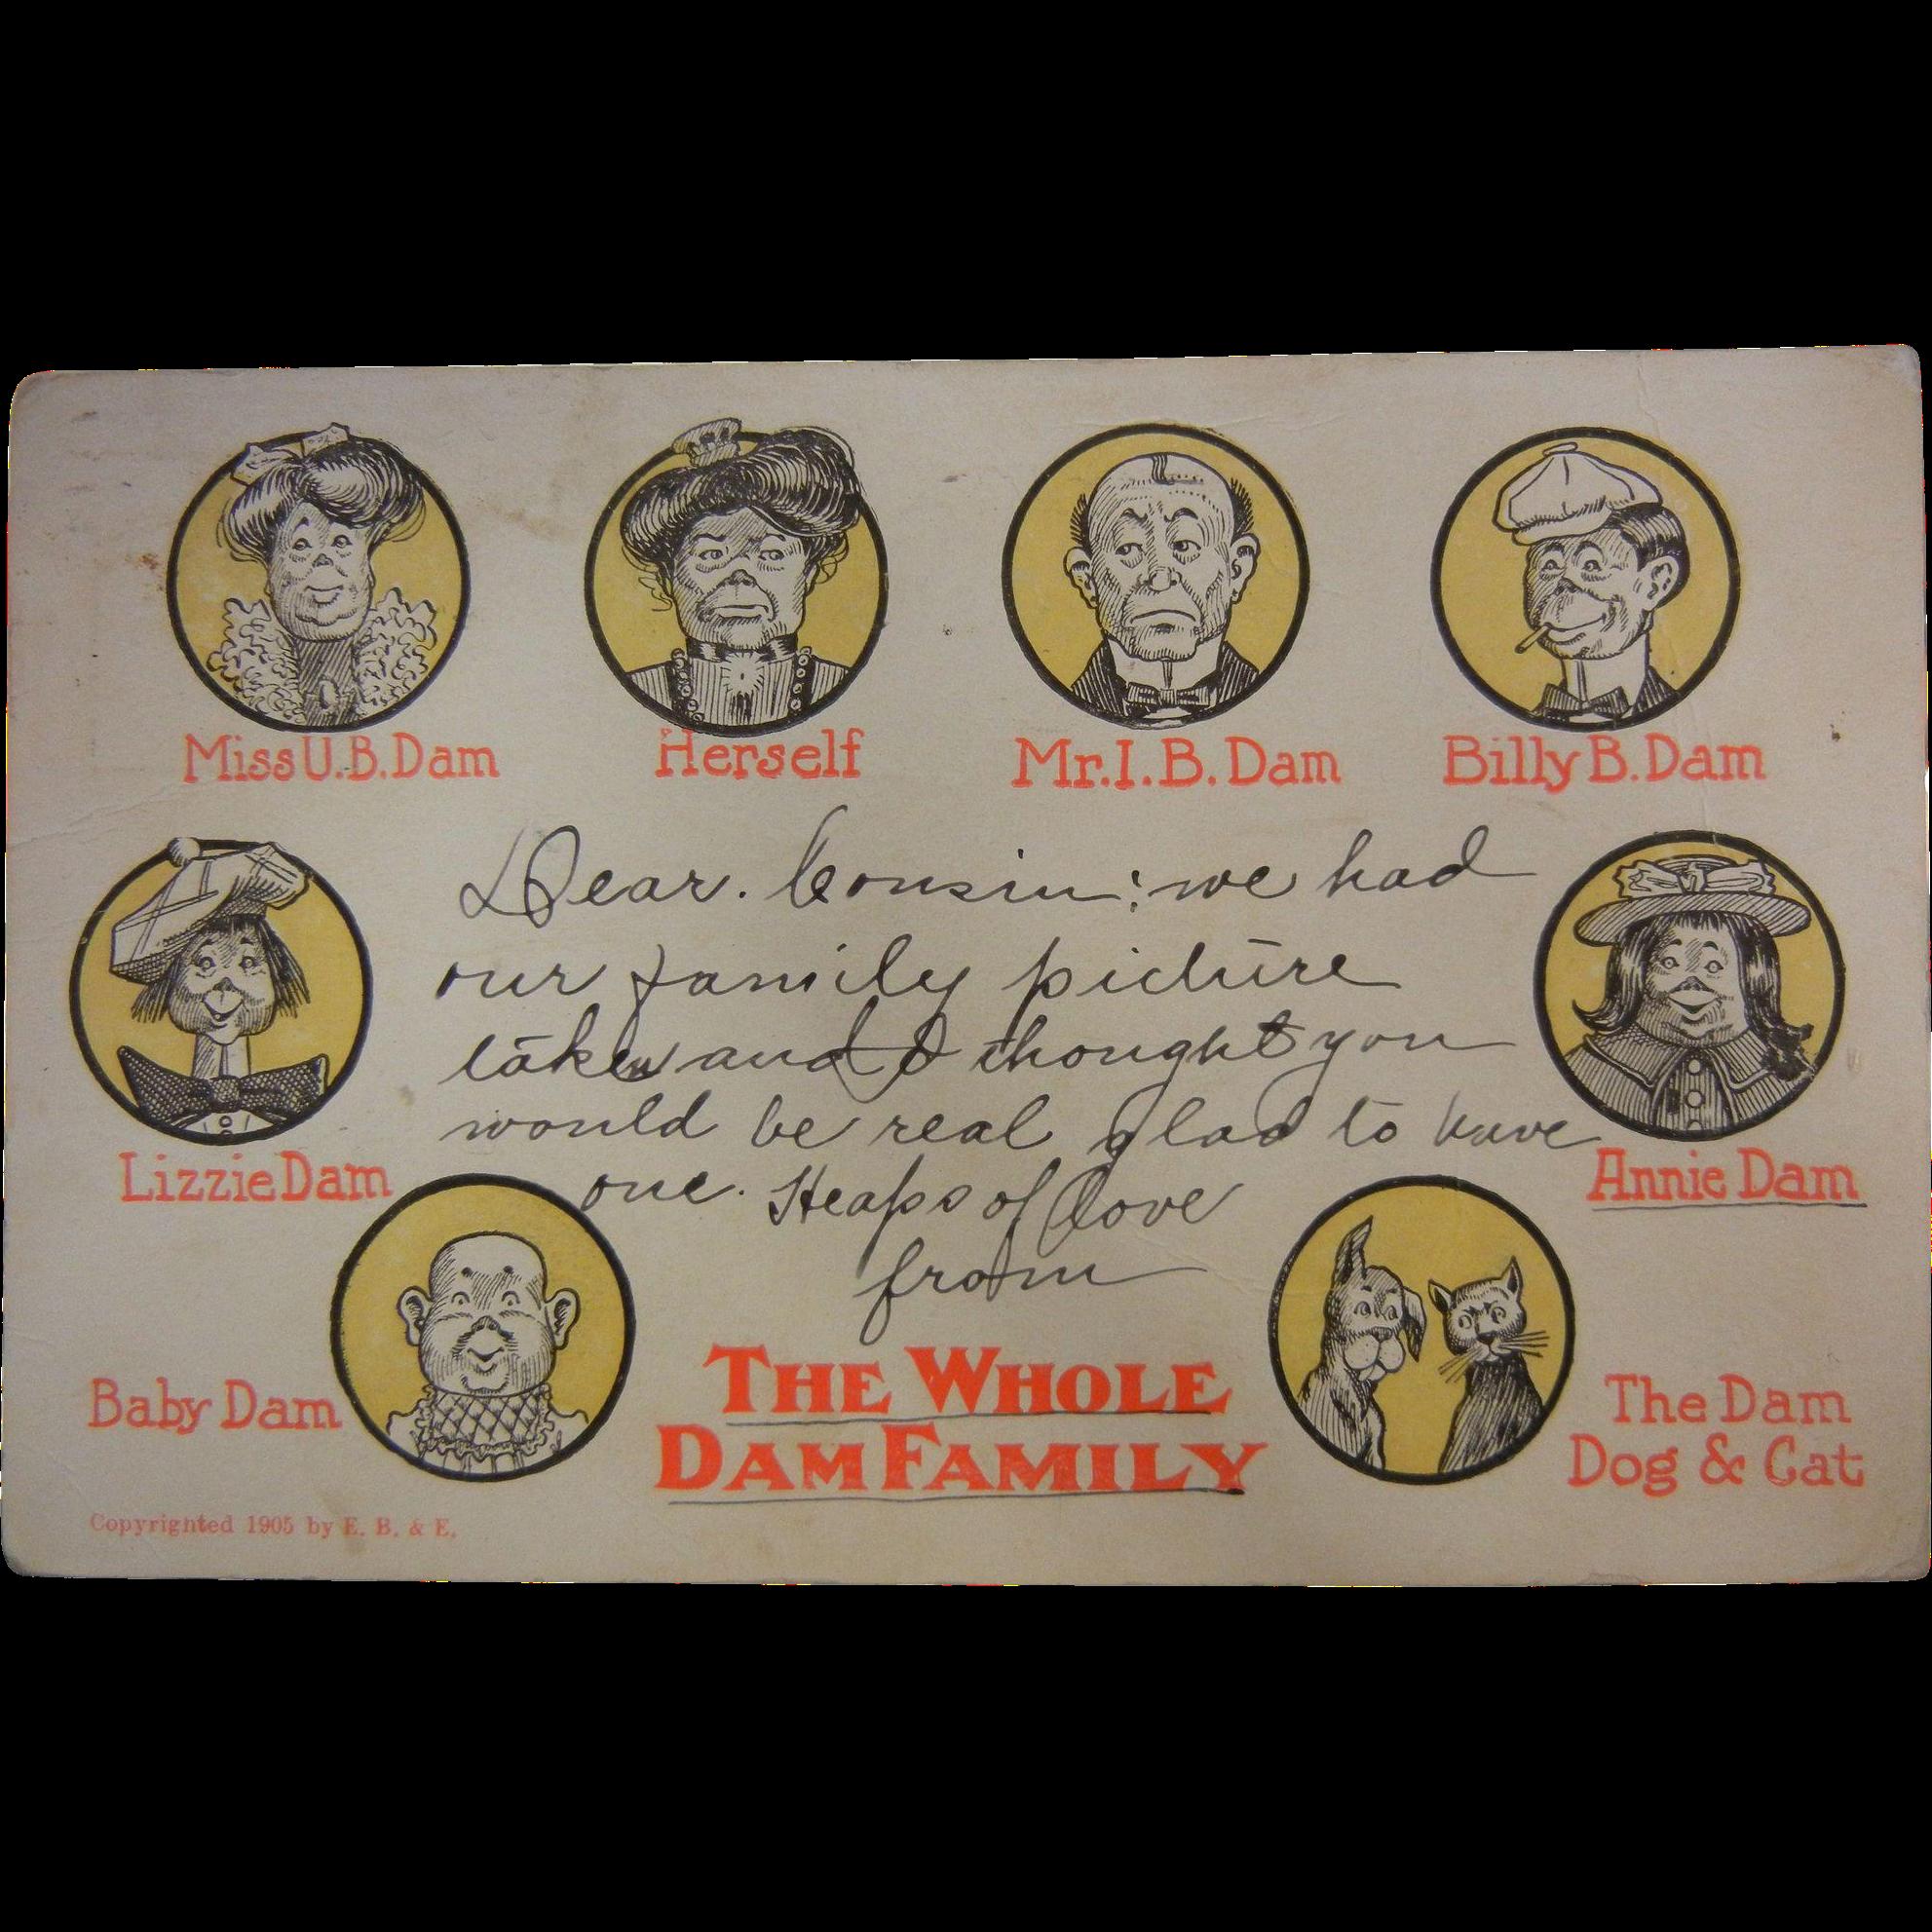 1905 Postcard by E.B.&E. - 'The Whole Dam Family'